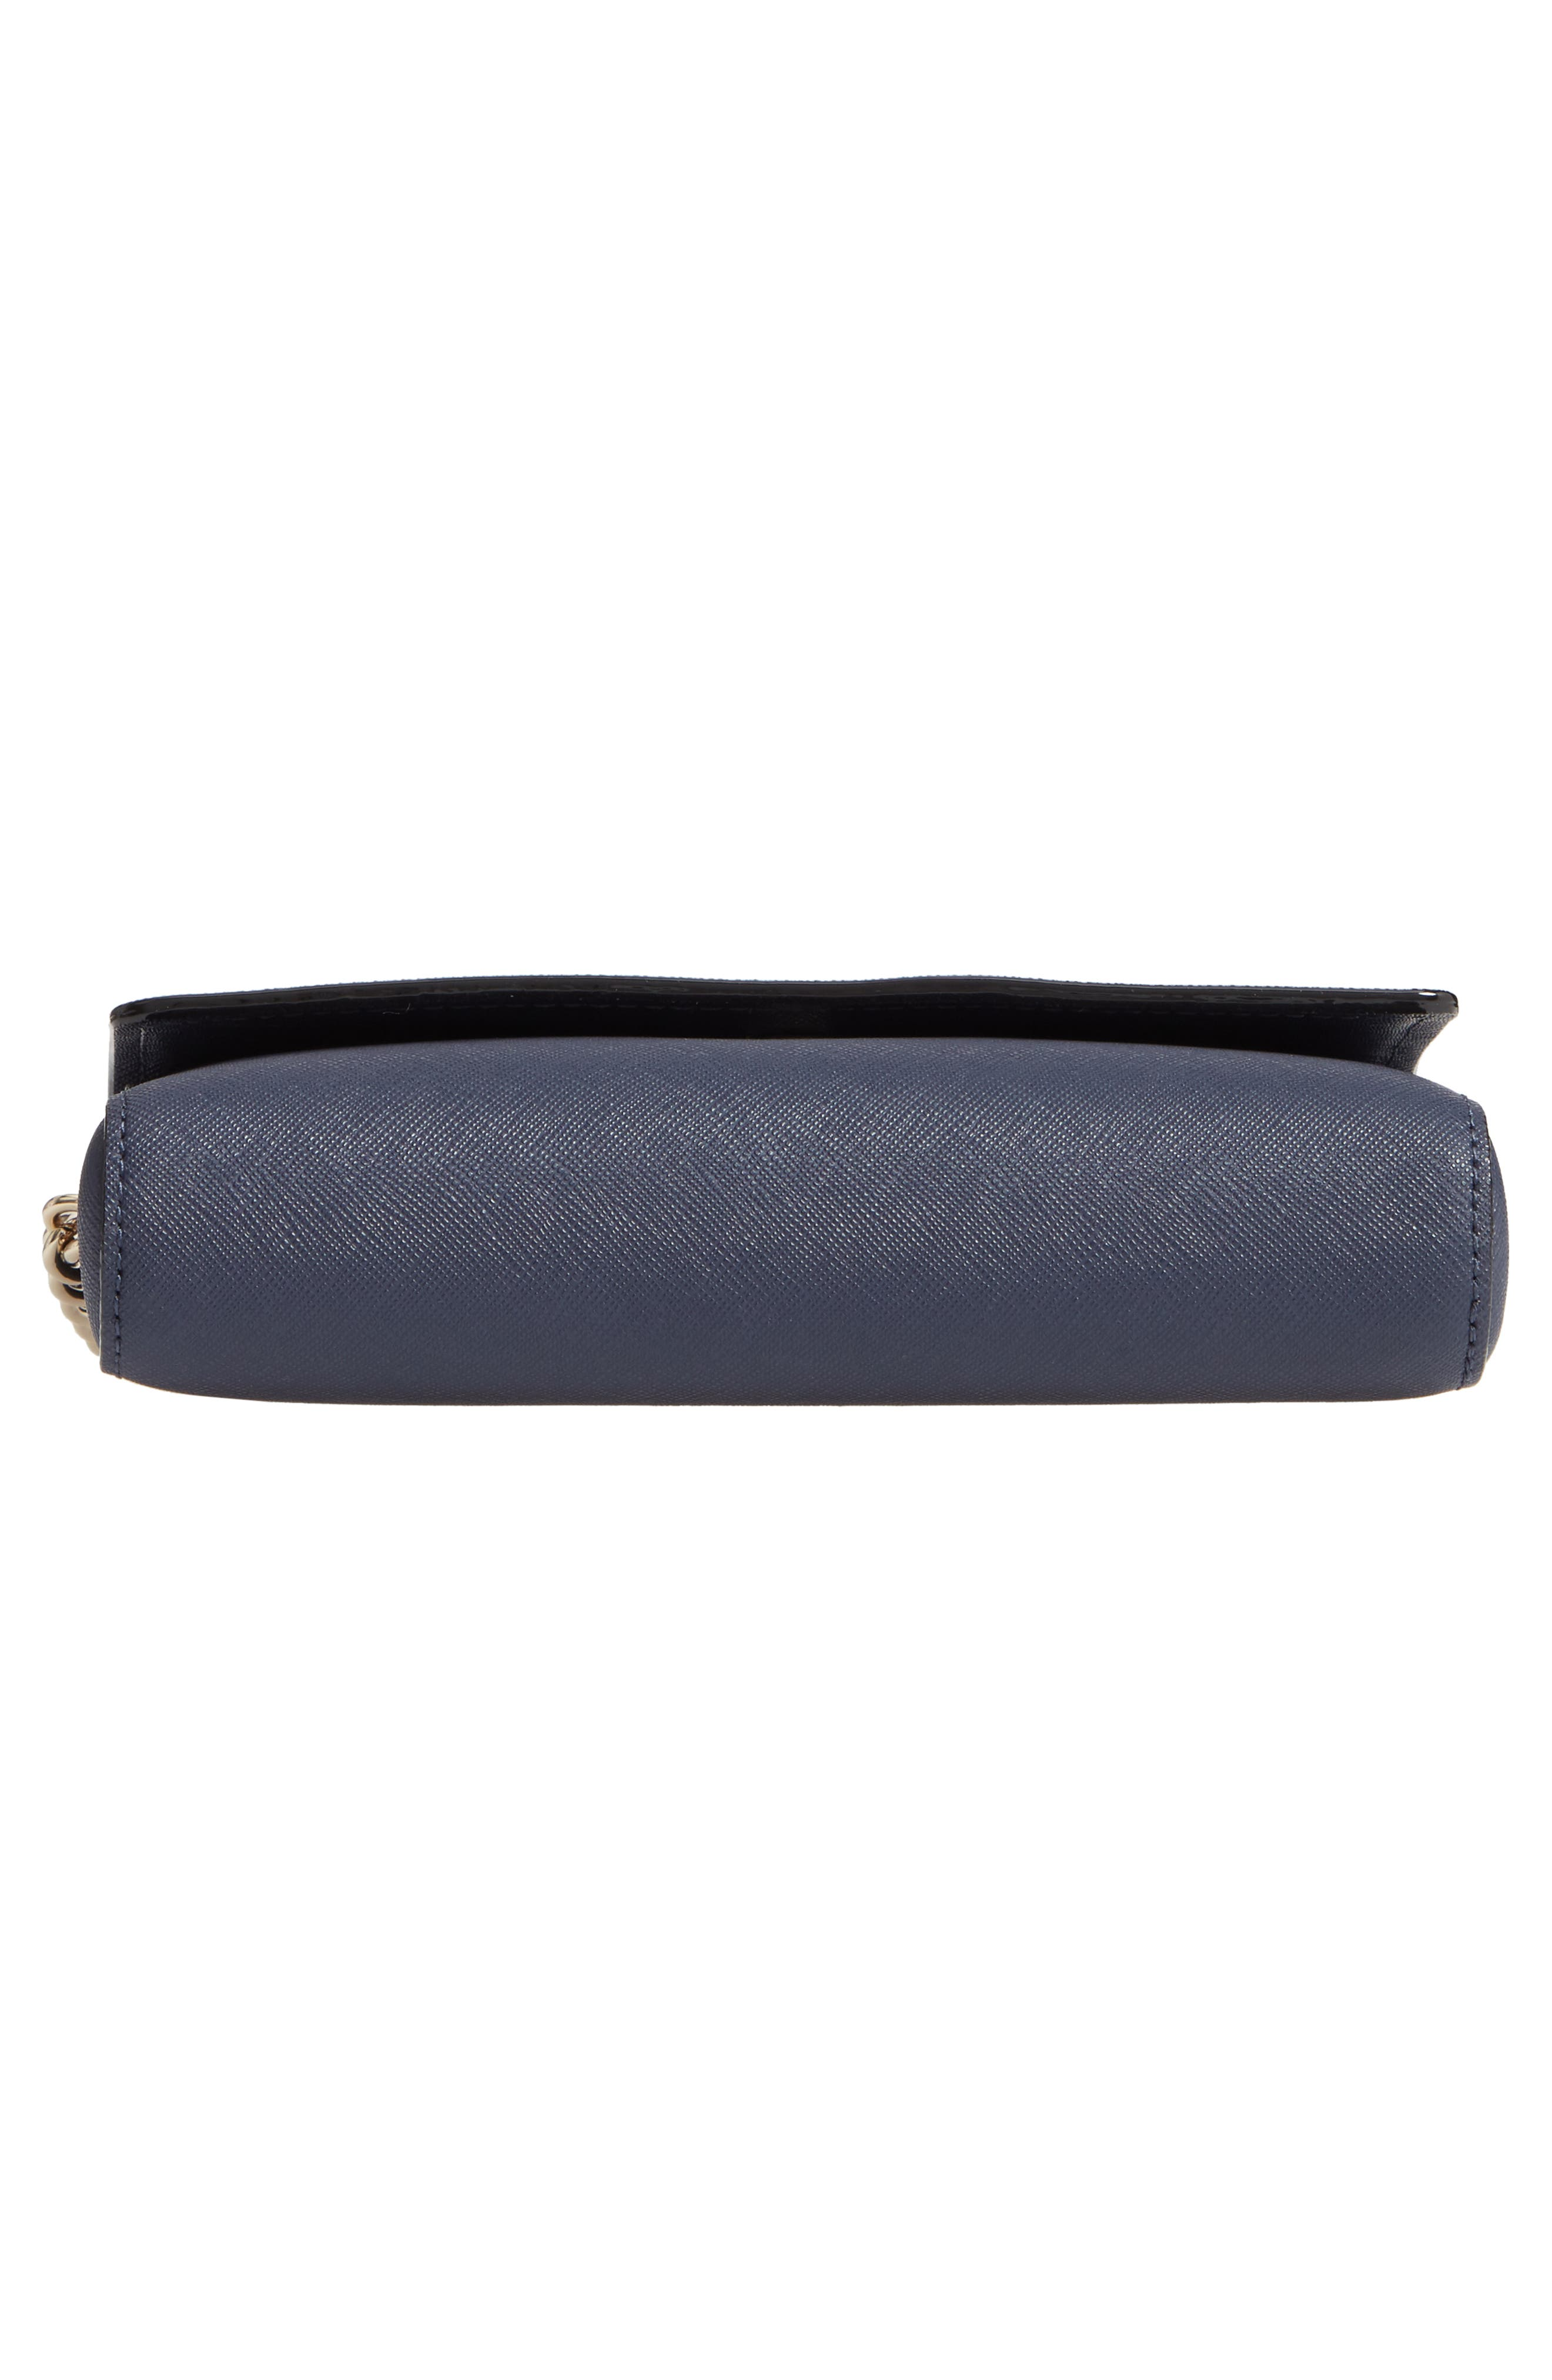 cameron street - delilah belt bag,                             Alternate thumbnail 6, color,                             BLAZER BLUE